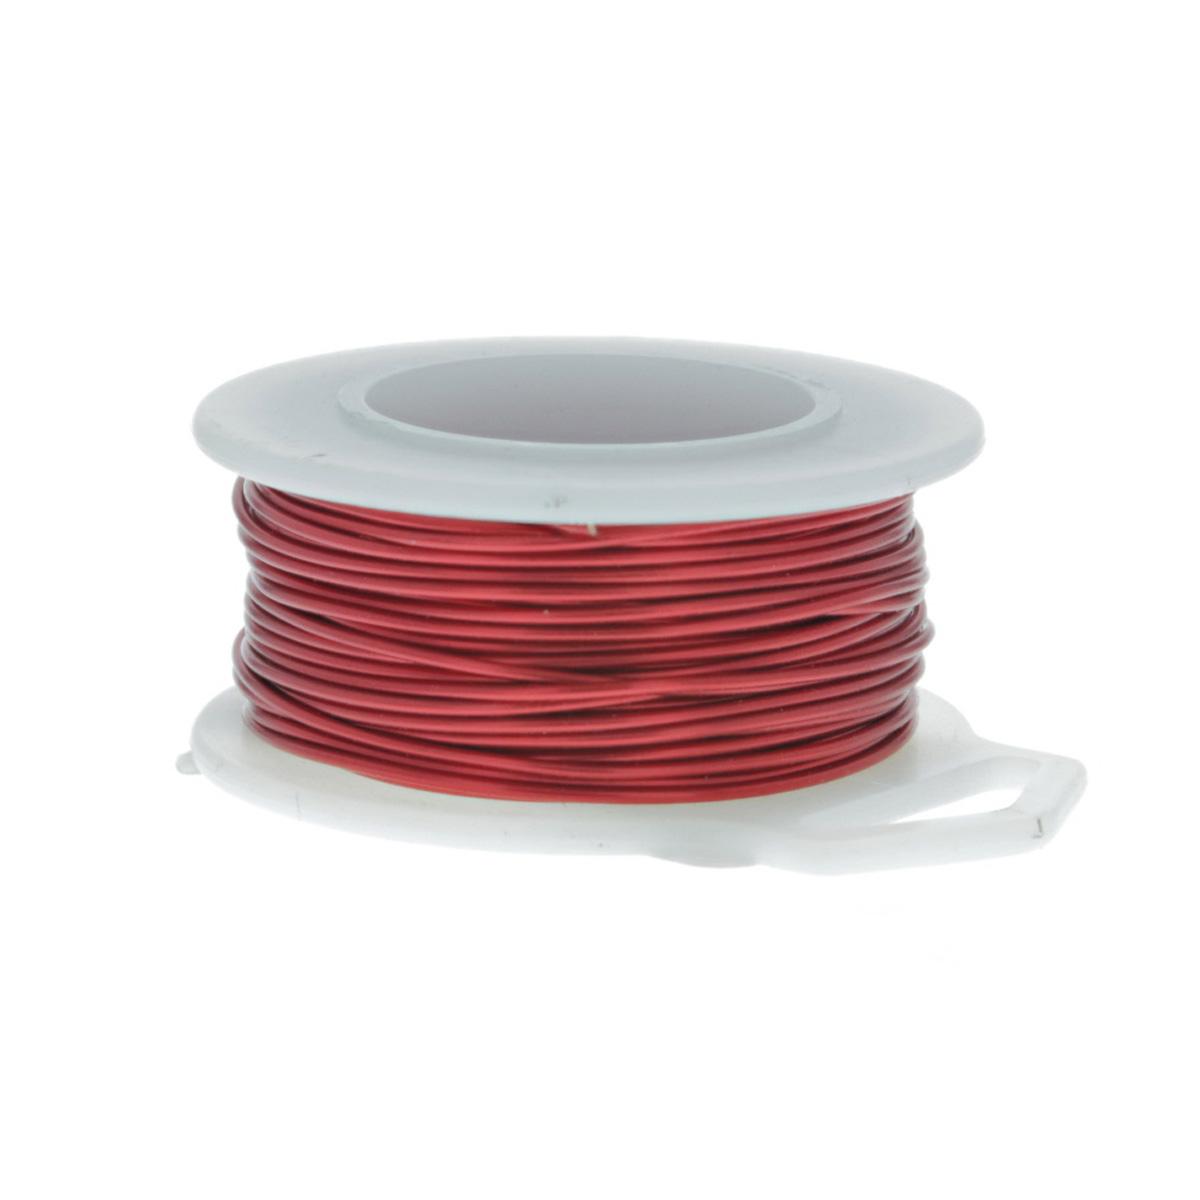 22 gauge round red enameled craft wire 45 ft wire for 22 gauge craft wire